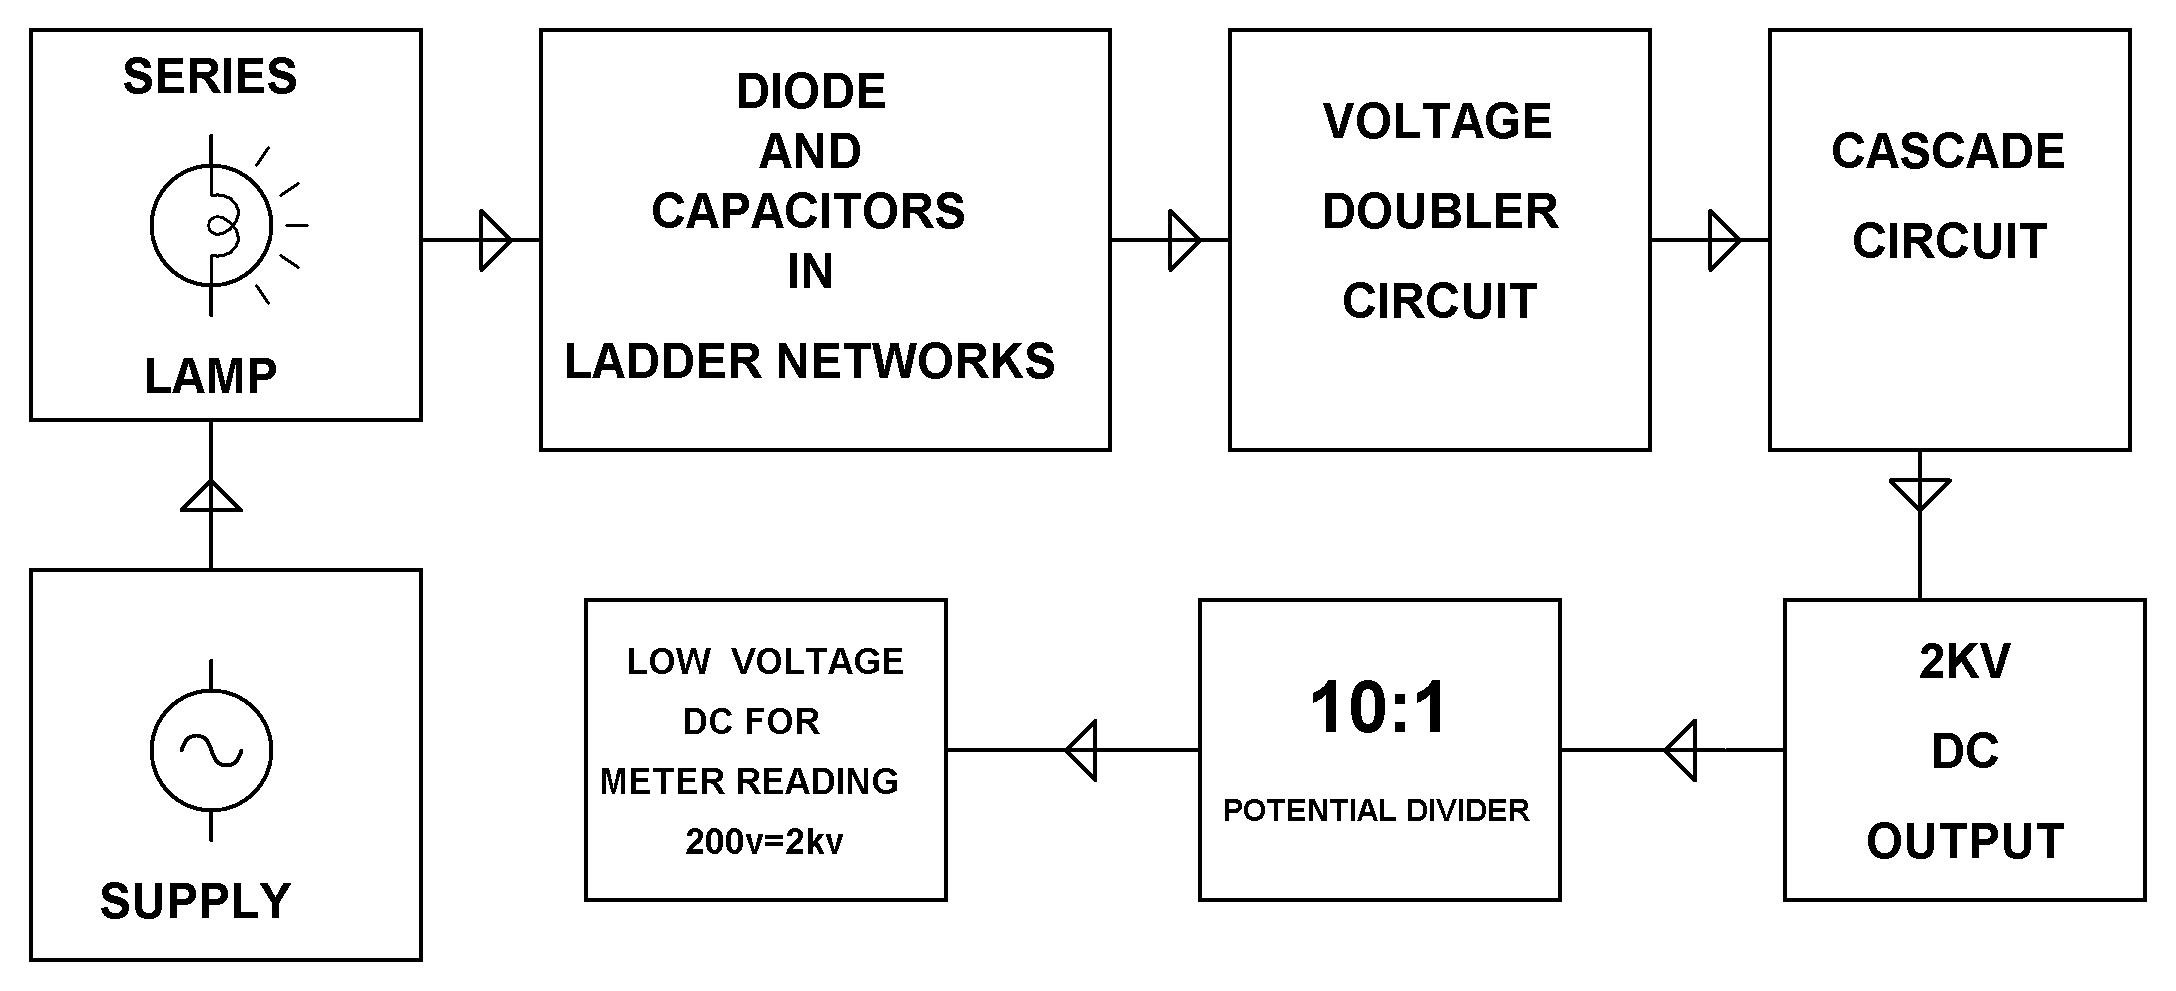 high voltage generator circuit diagram wiring diagram image. Black Bedroom Furniture Sets. Home Design Ideas